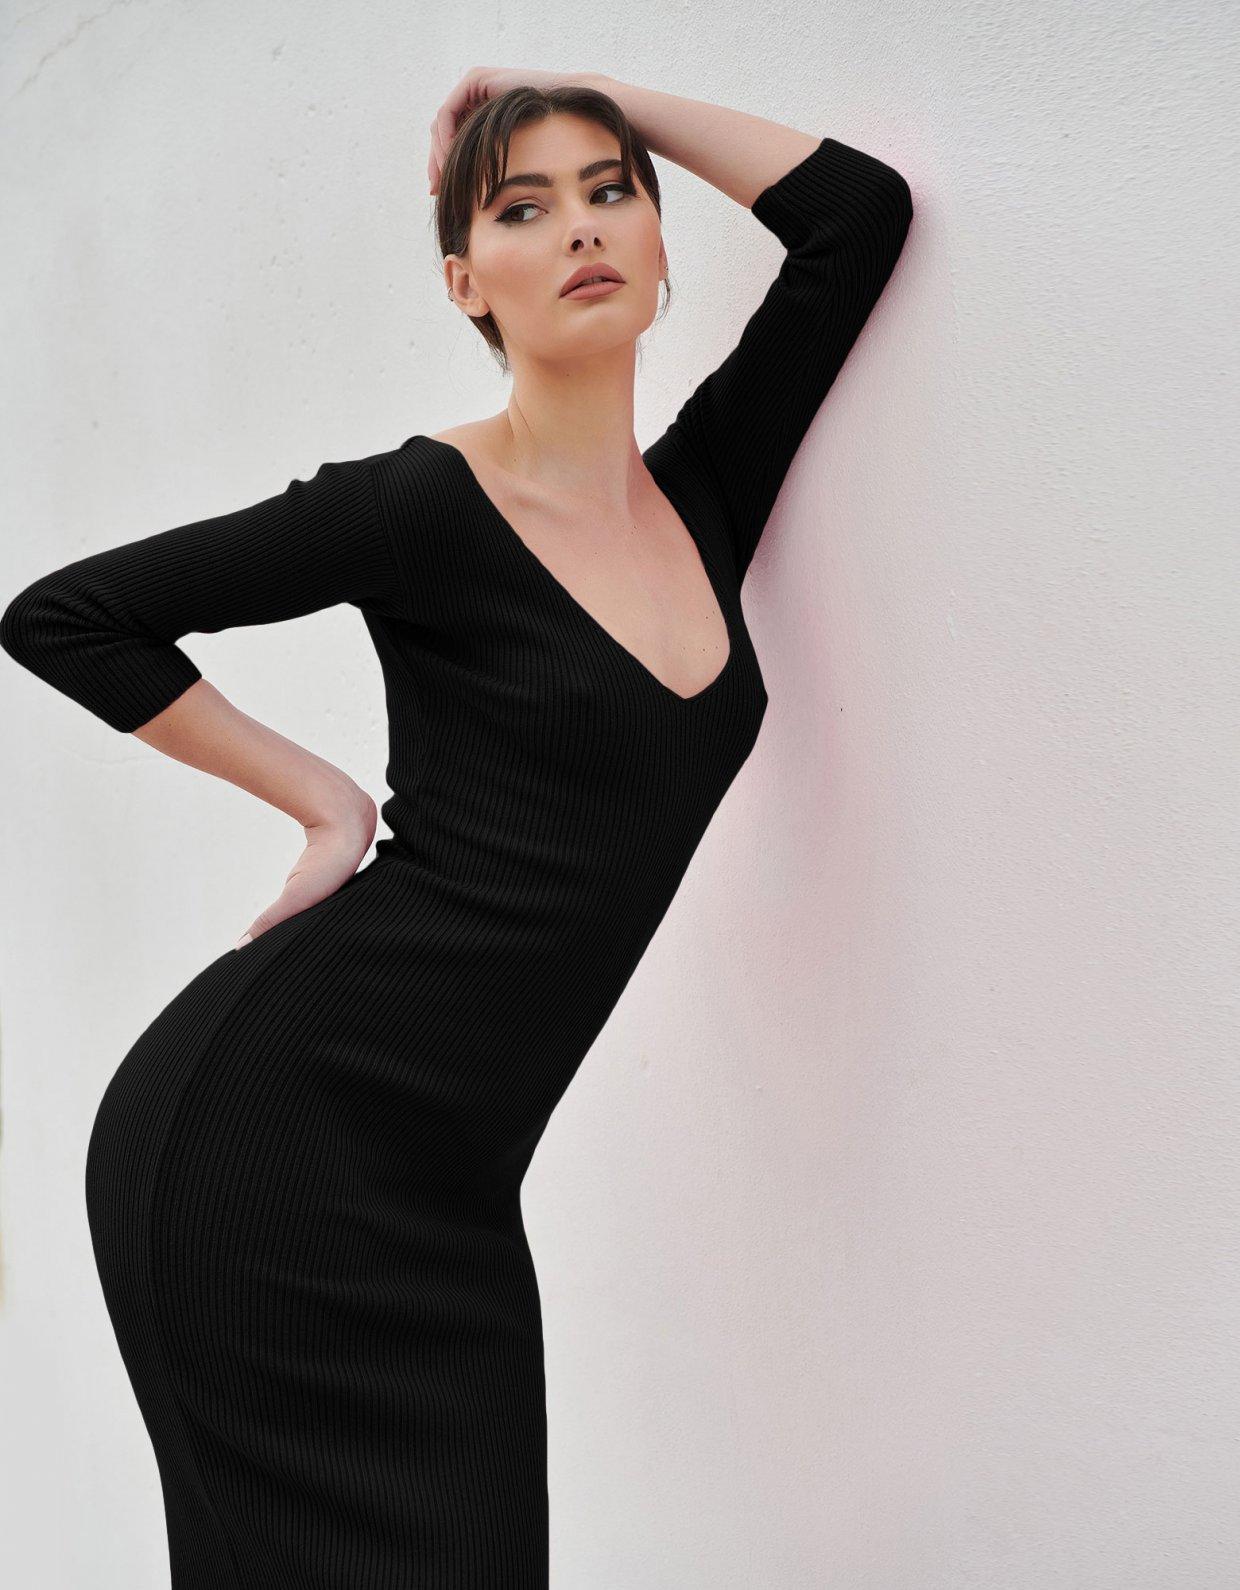 Combos Knitwear Combos S18 – Black midi dress 3/4